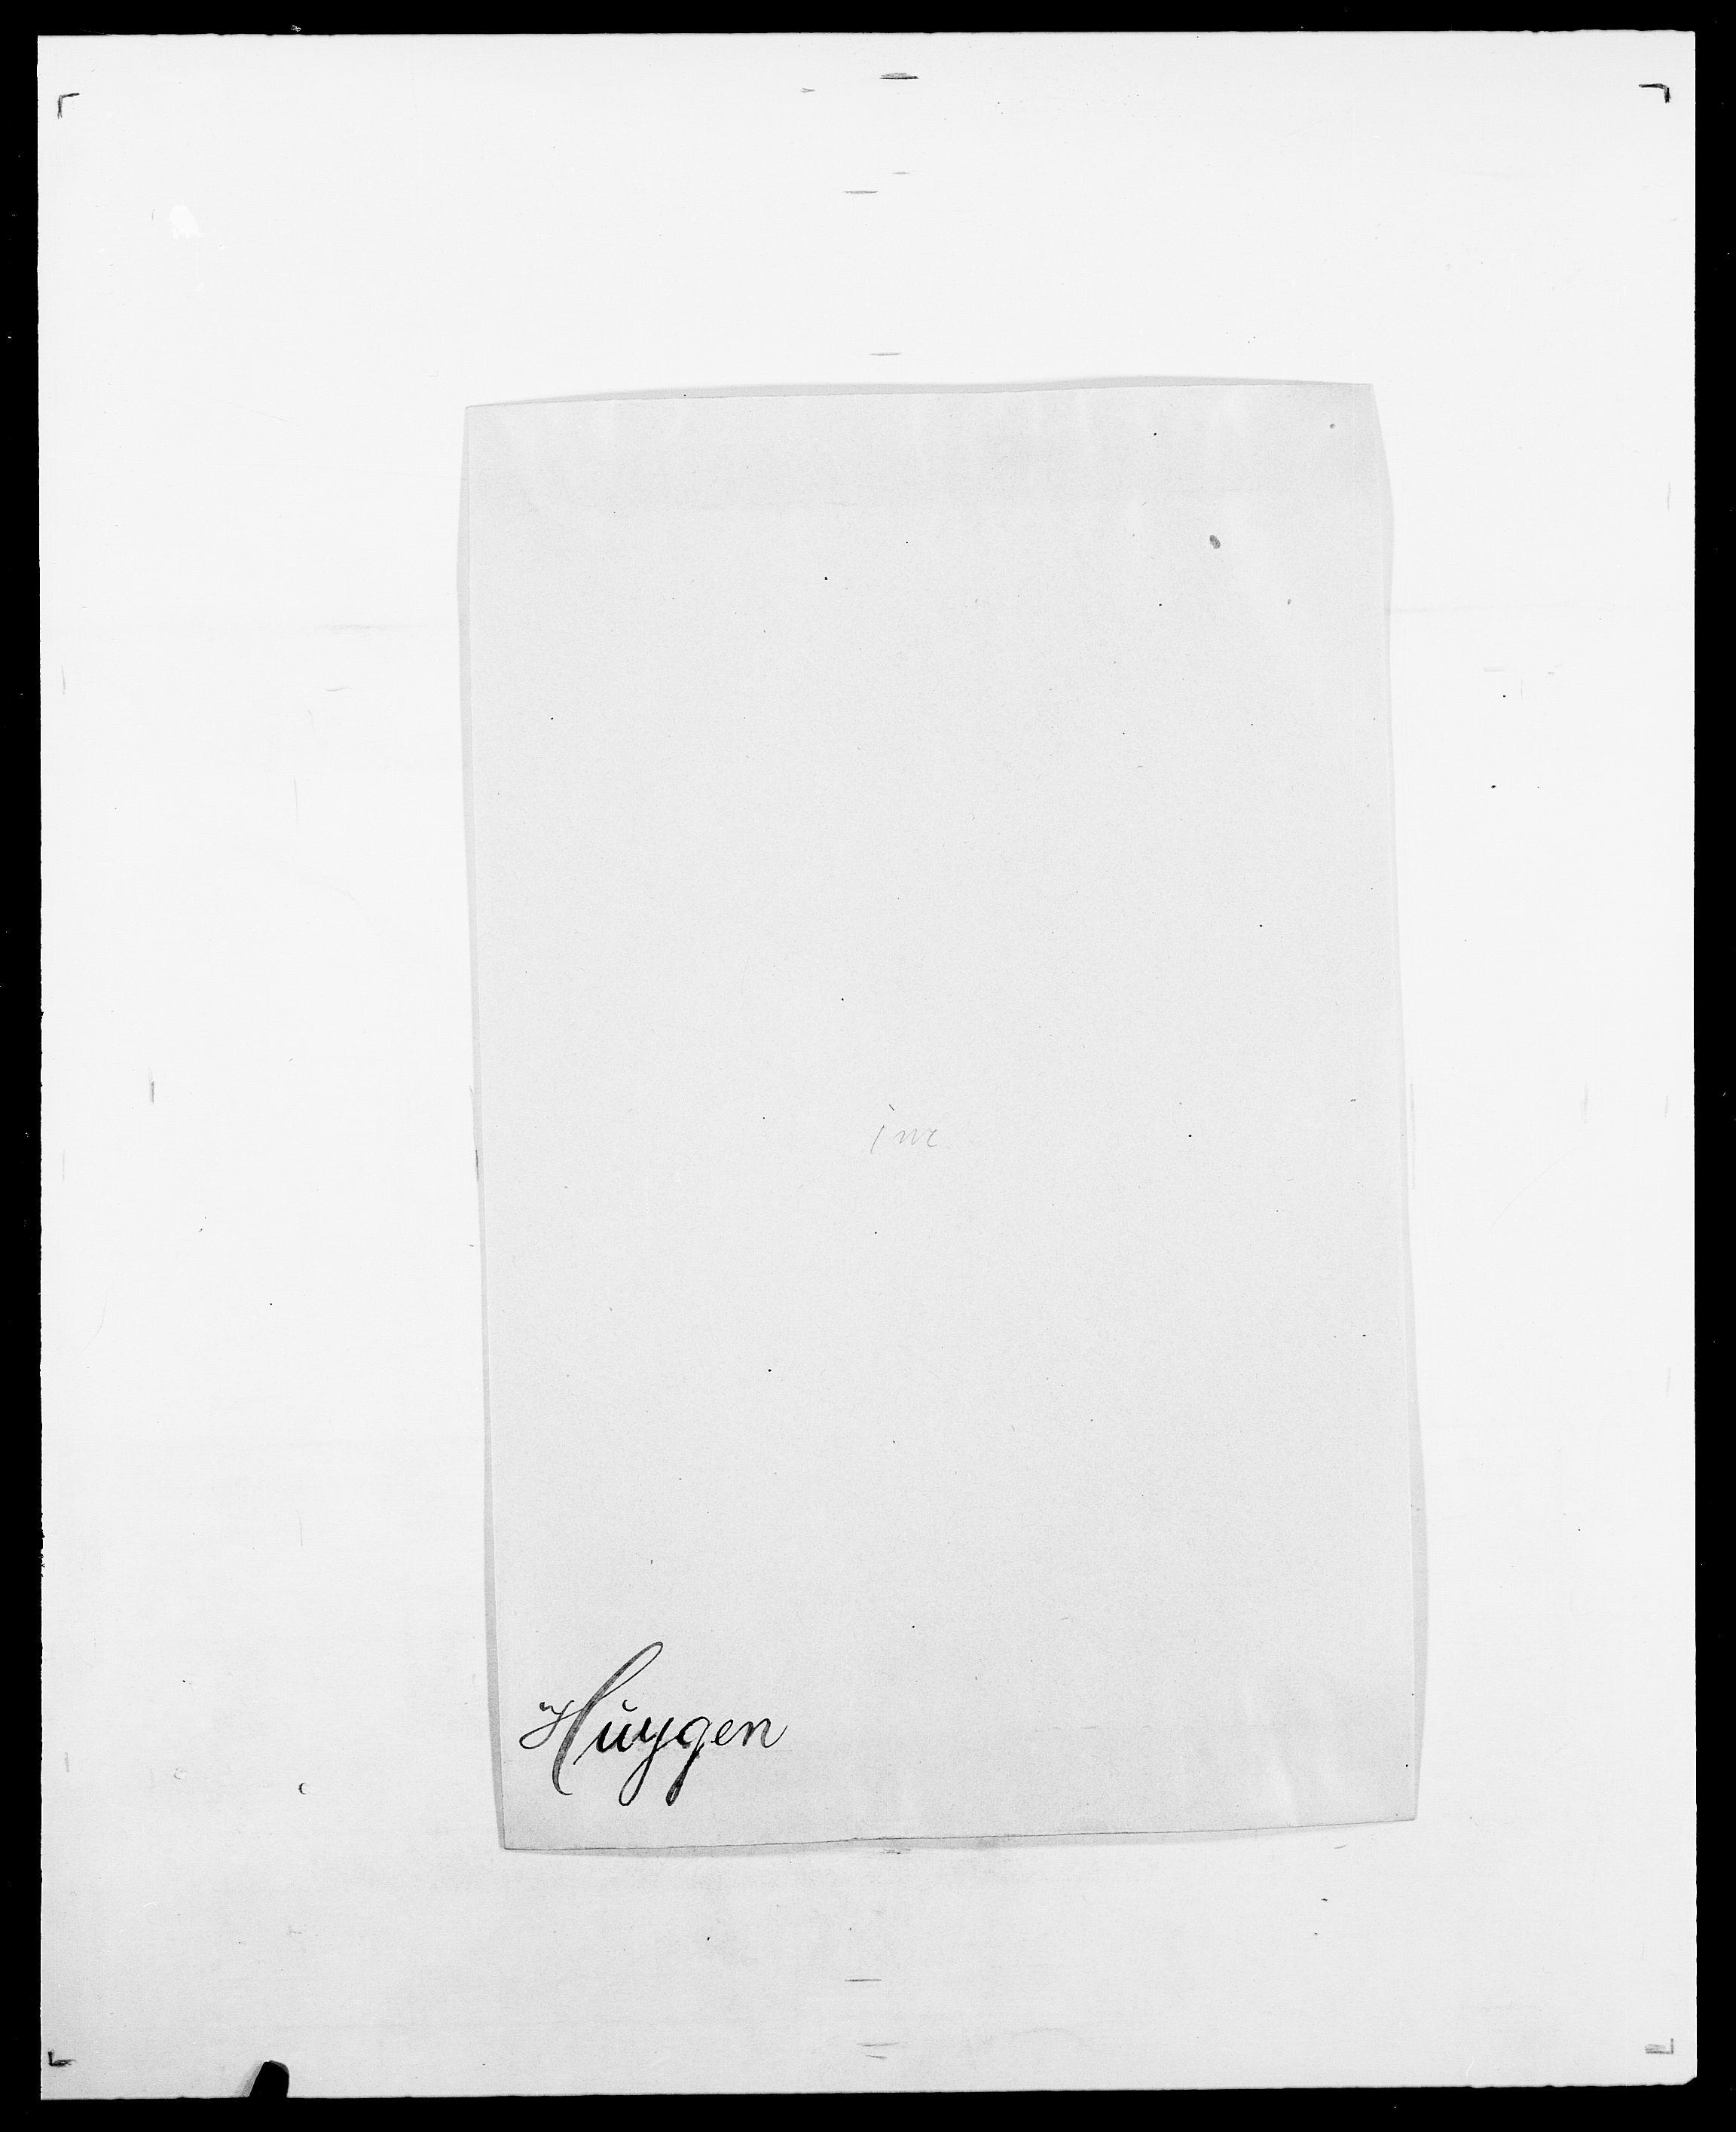 SAO, Delgobe, Charles Antoine - samling, D/Da/L0019: van der Hude - Joys, s. 110